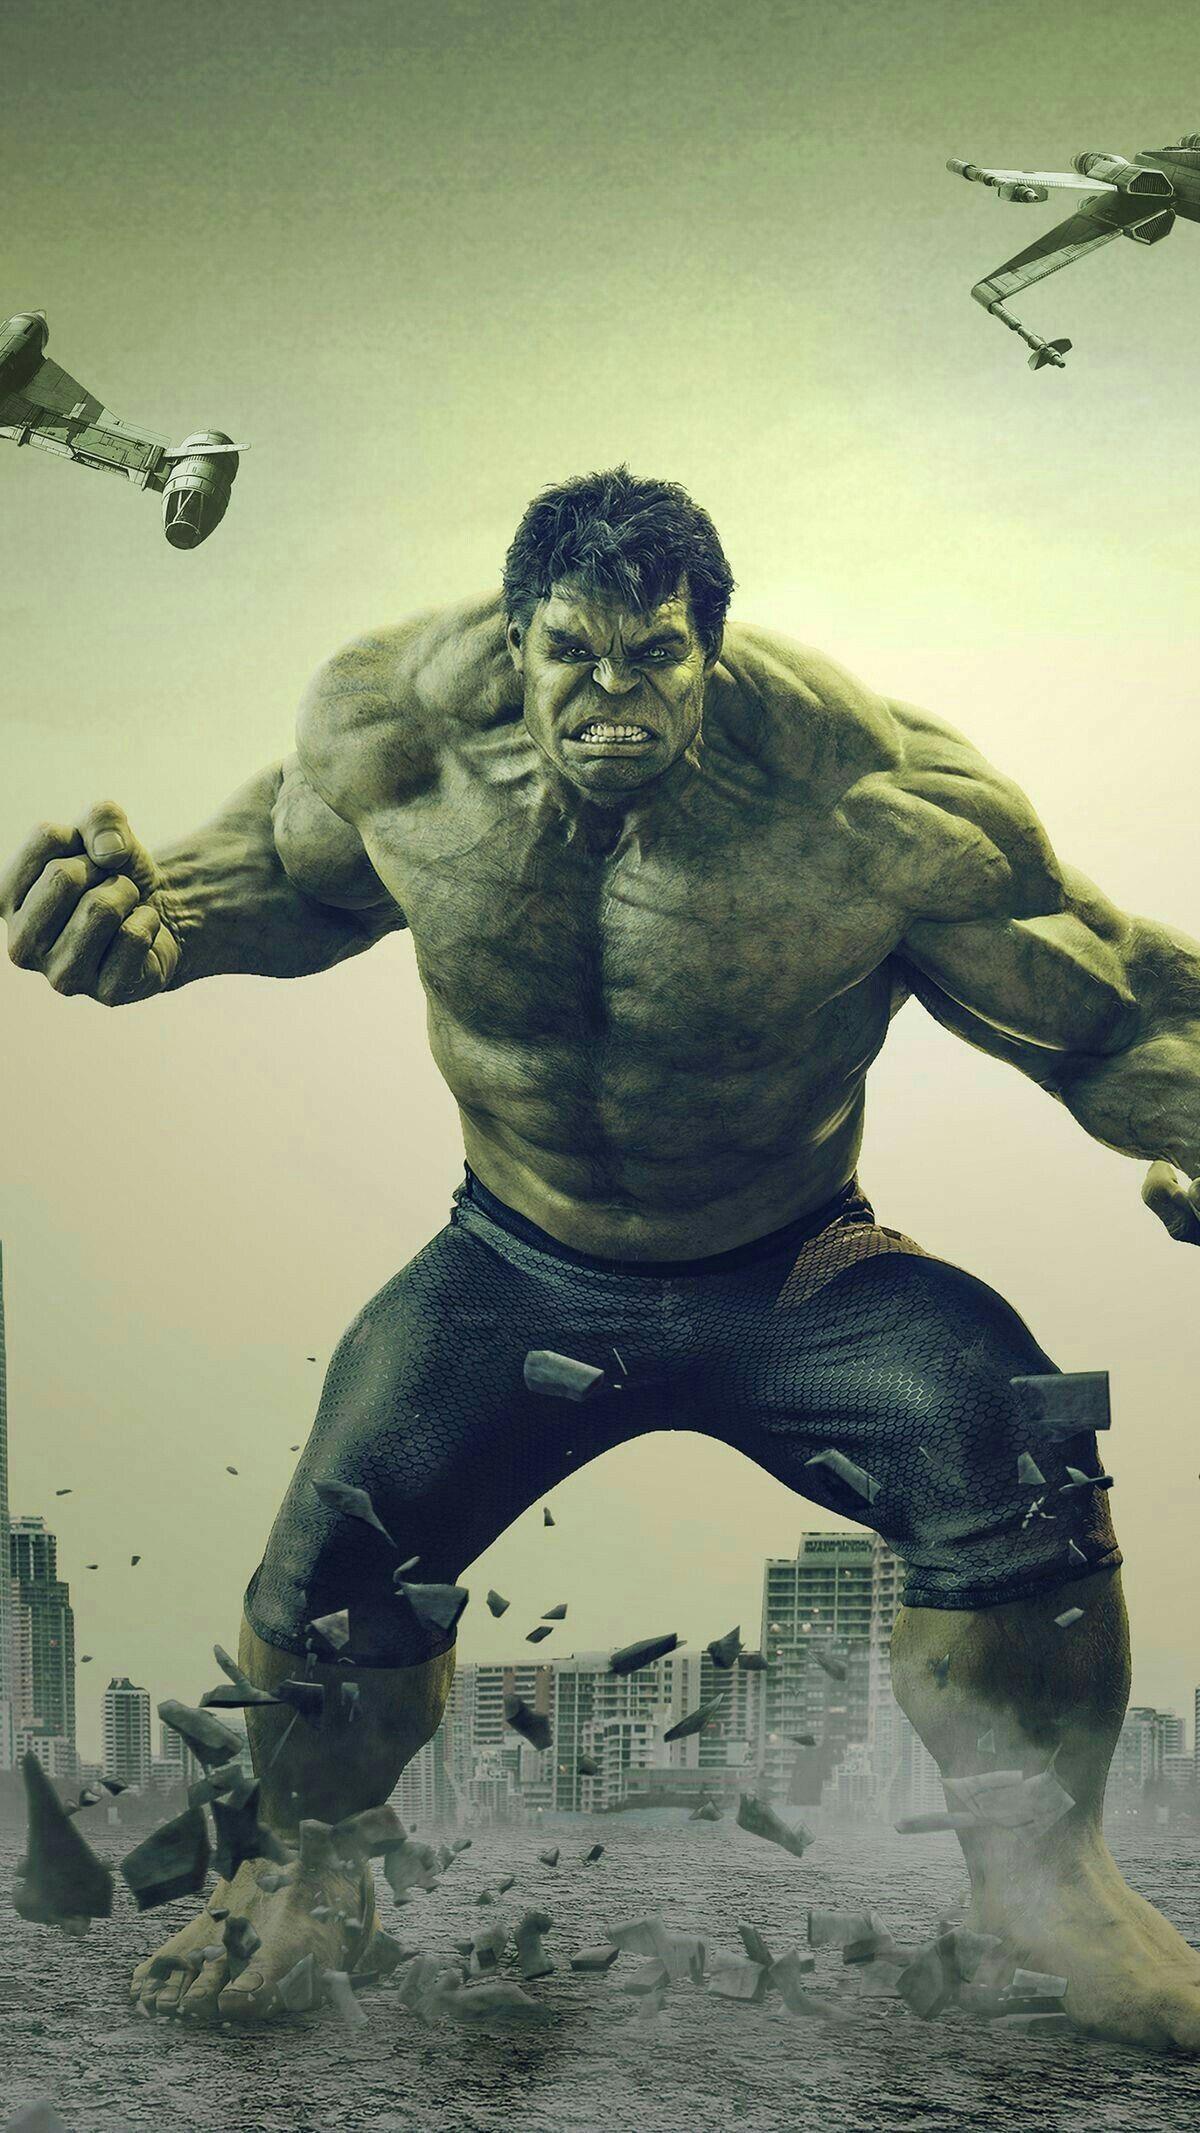 Angry Hulk Hulk Marvel Hulk Avengers Incredible Hulk